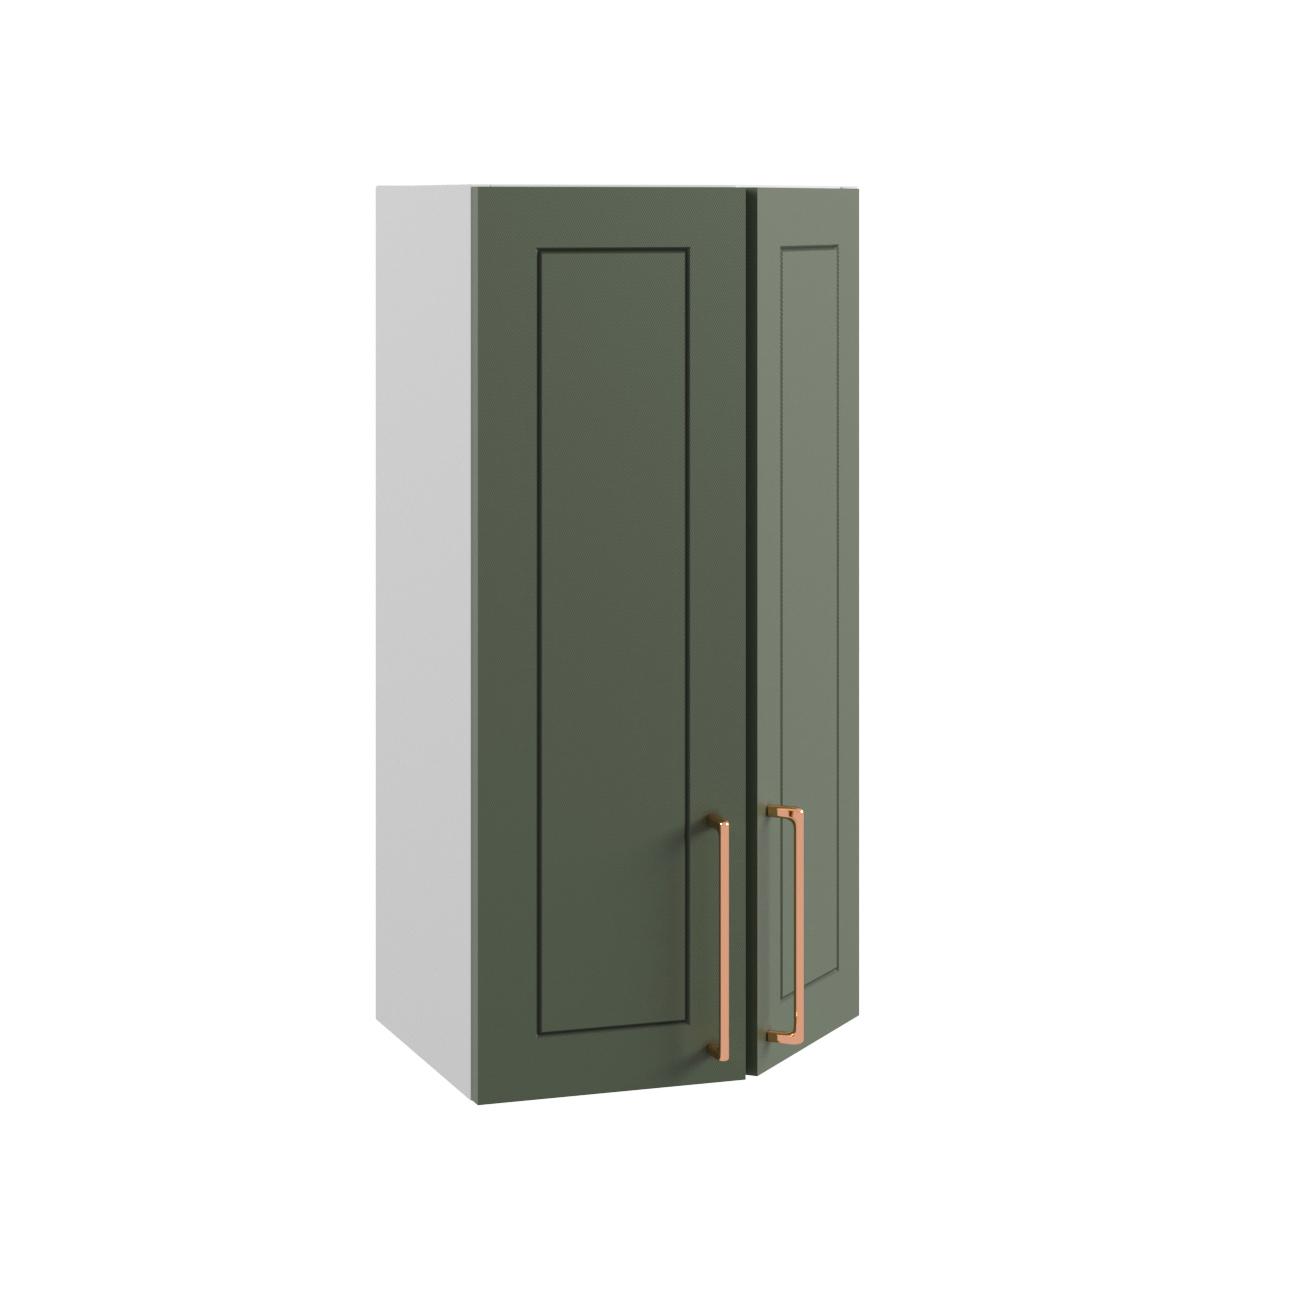 Кухня Квадро ПТ 400 Шкаф верхний торцевой